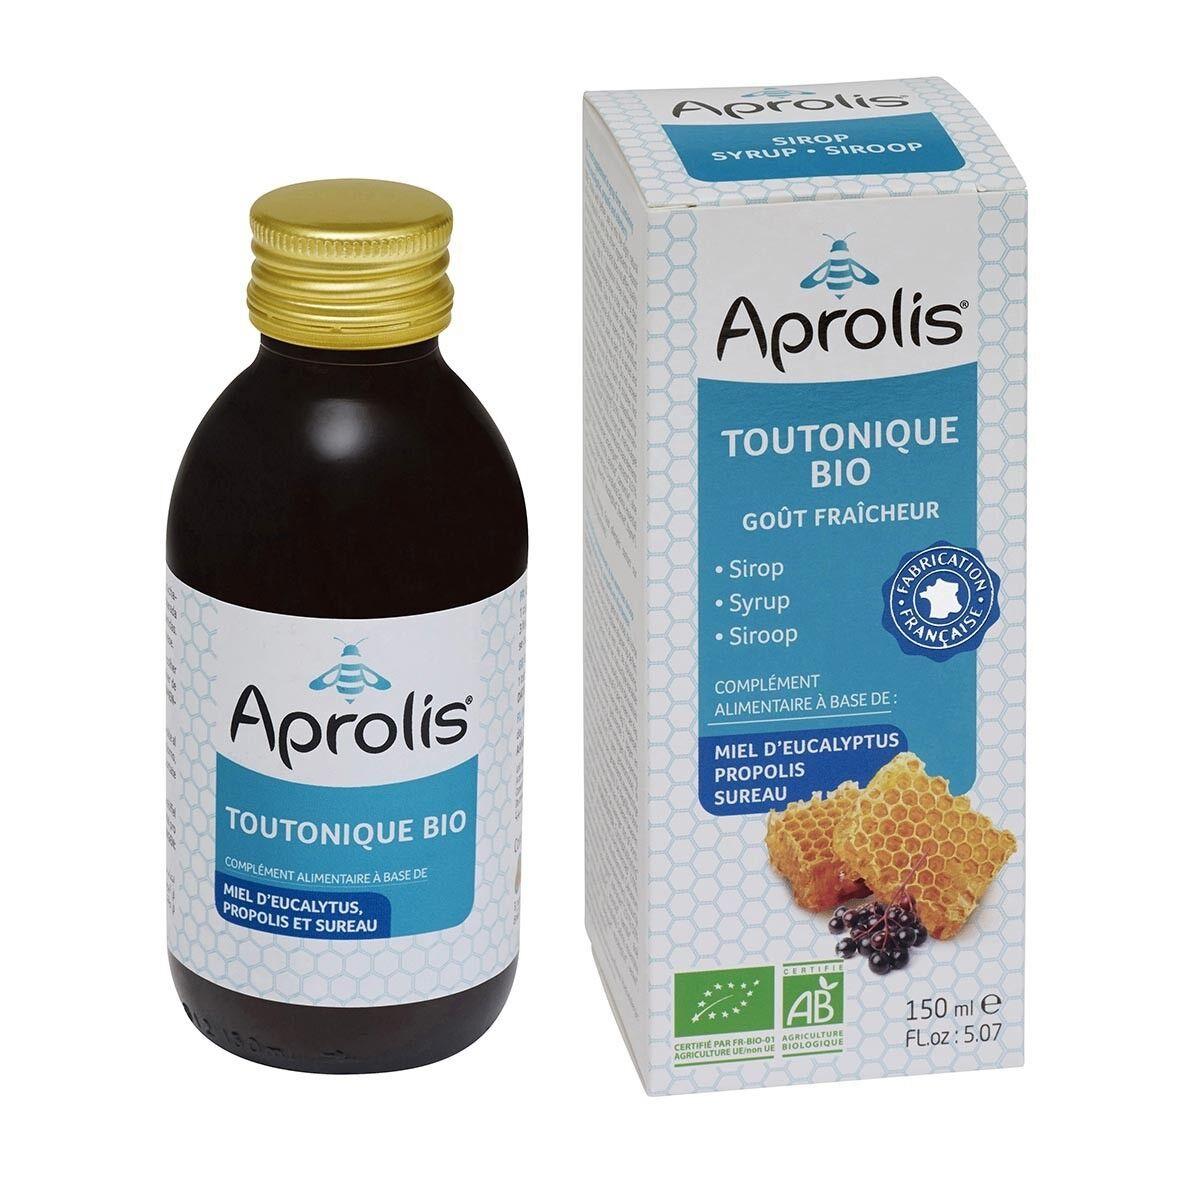 APROLIS Toutonique 150ml Bio - Aprolis